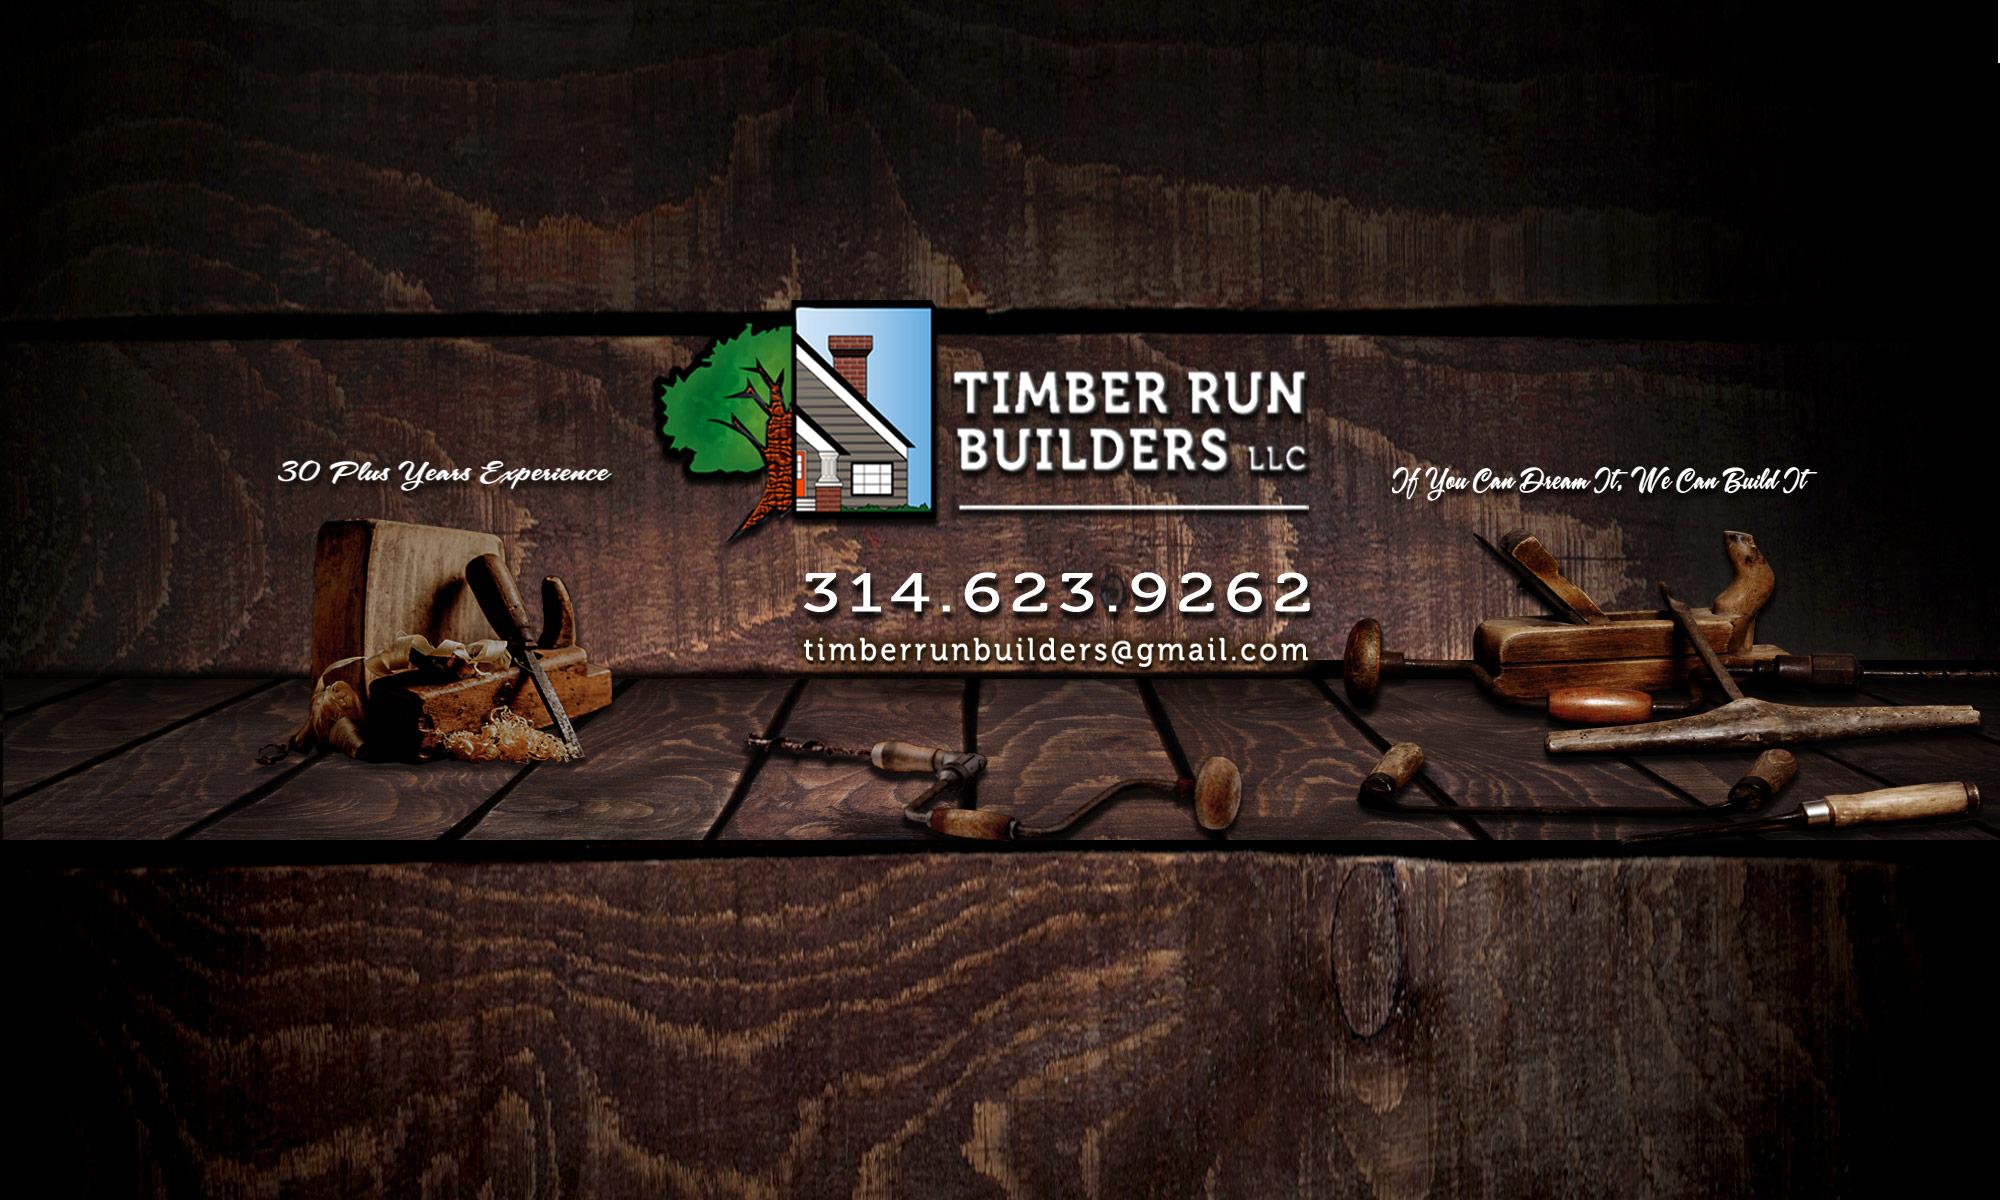 Timber Run Builders LLC